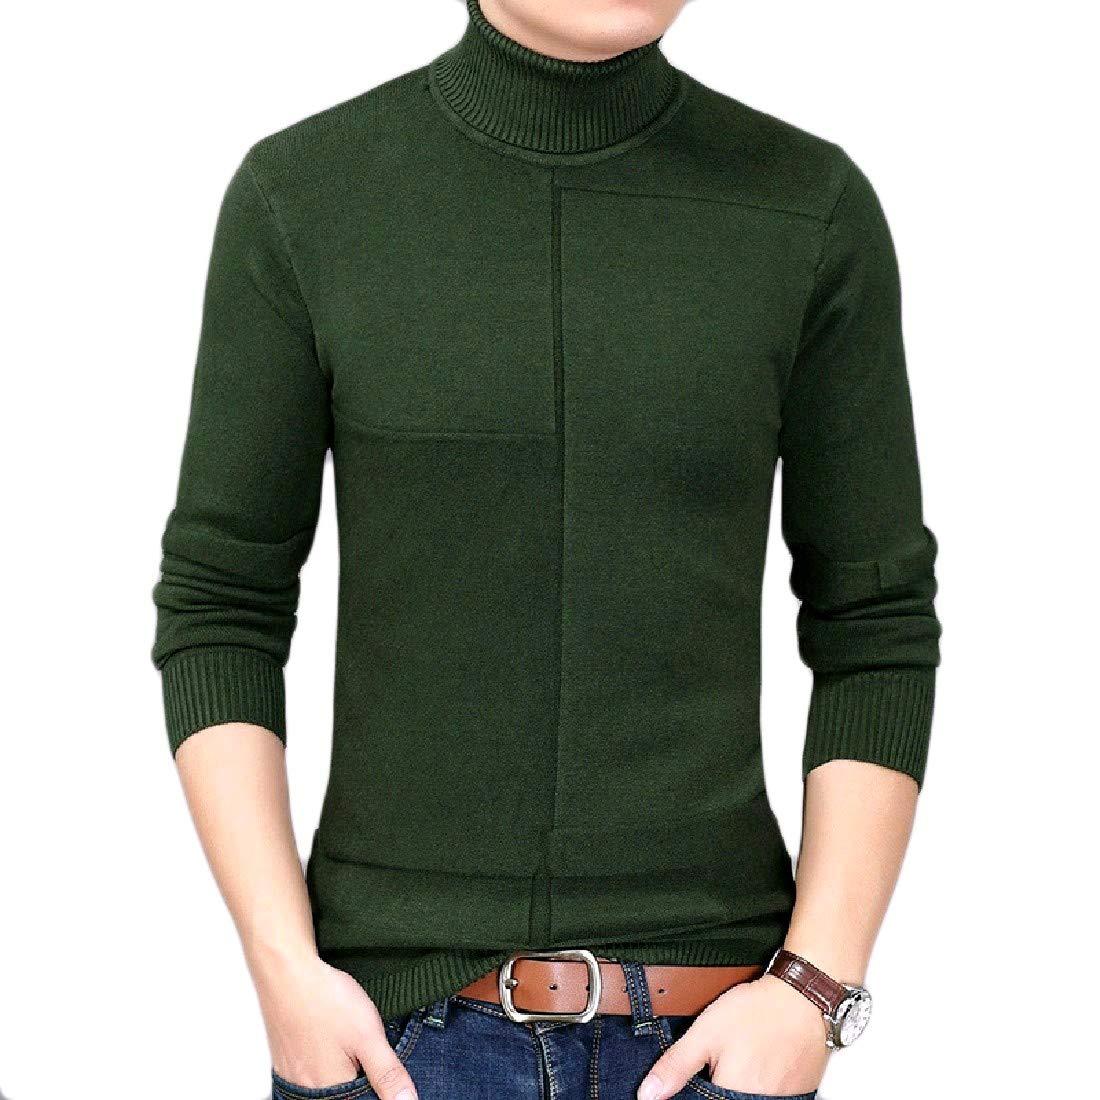 VividYou Mens Business Premium Plus Size Tailored Pullover Sweater